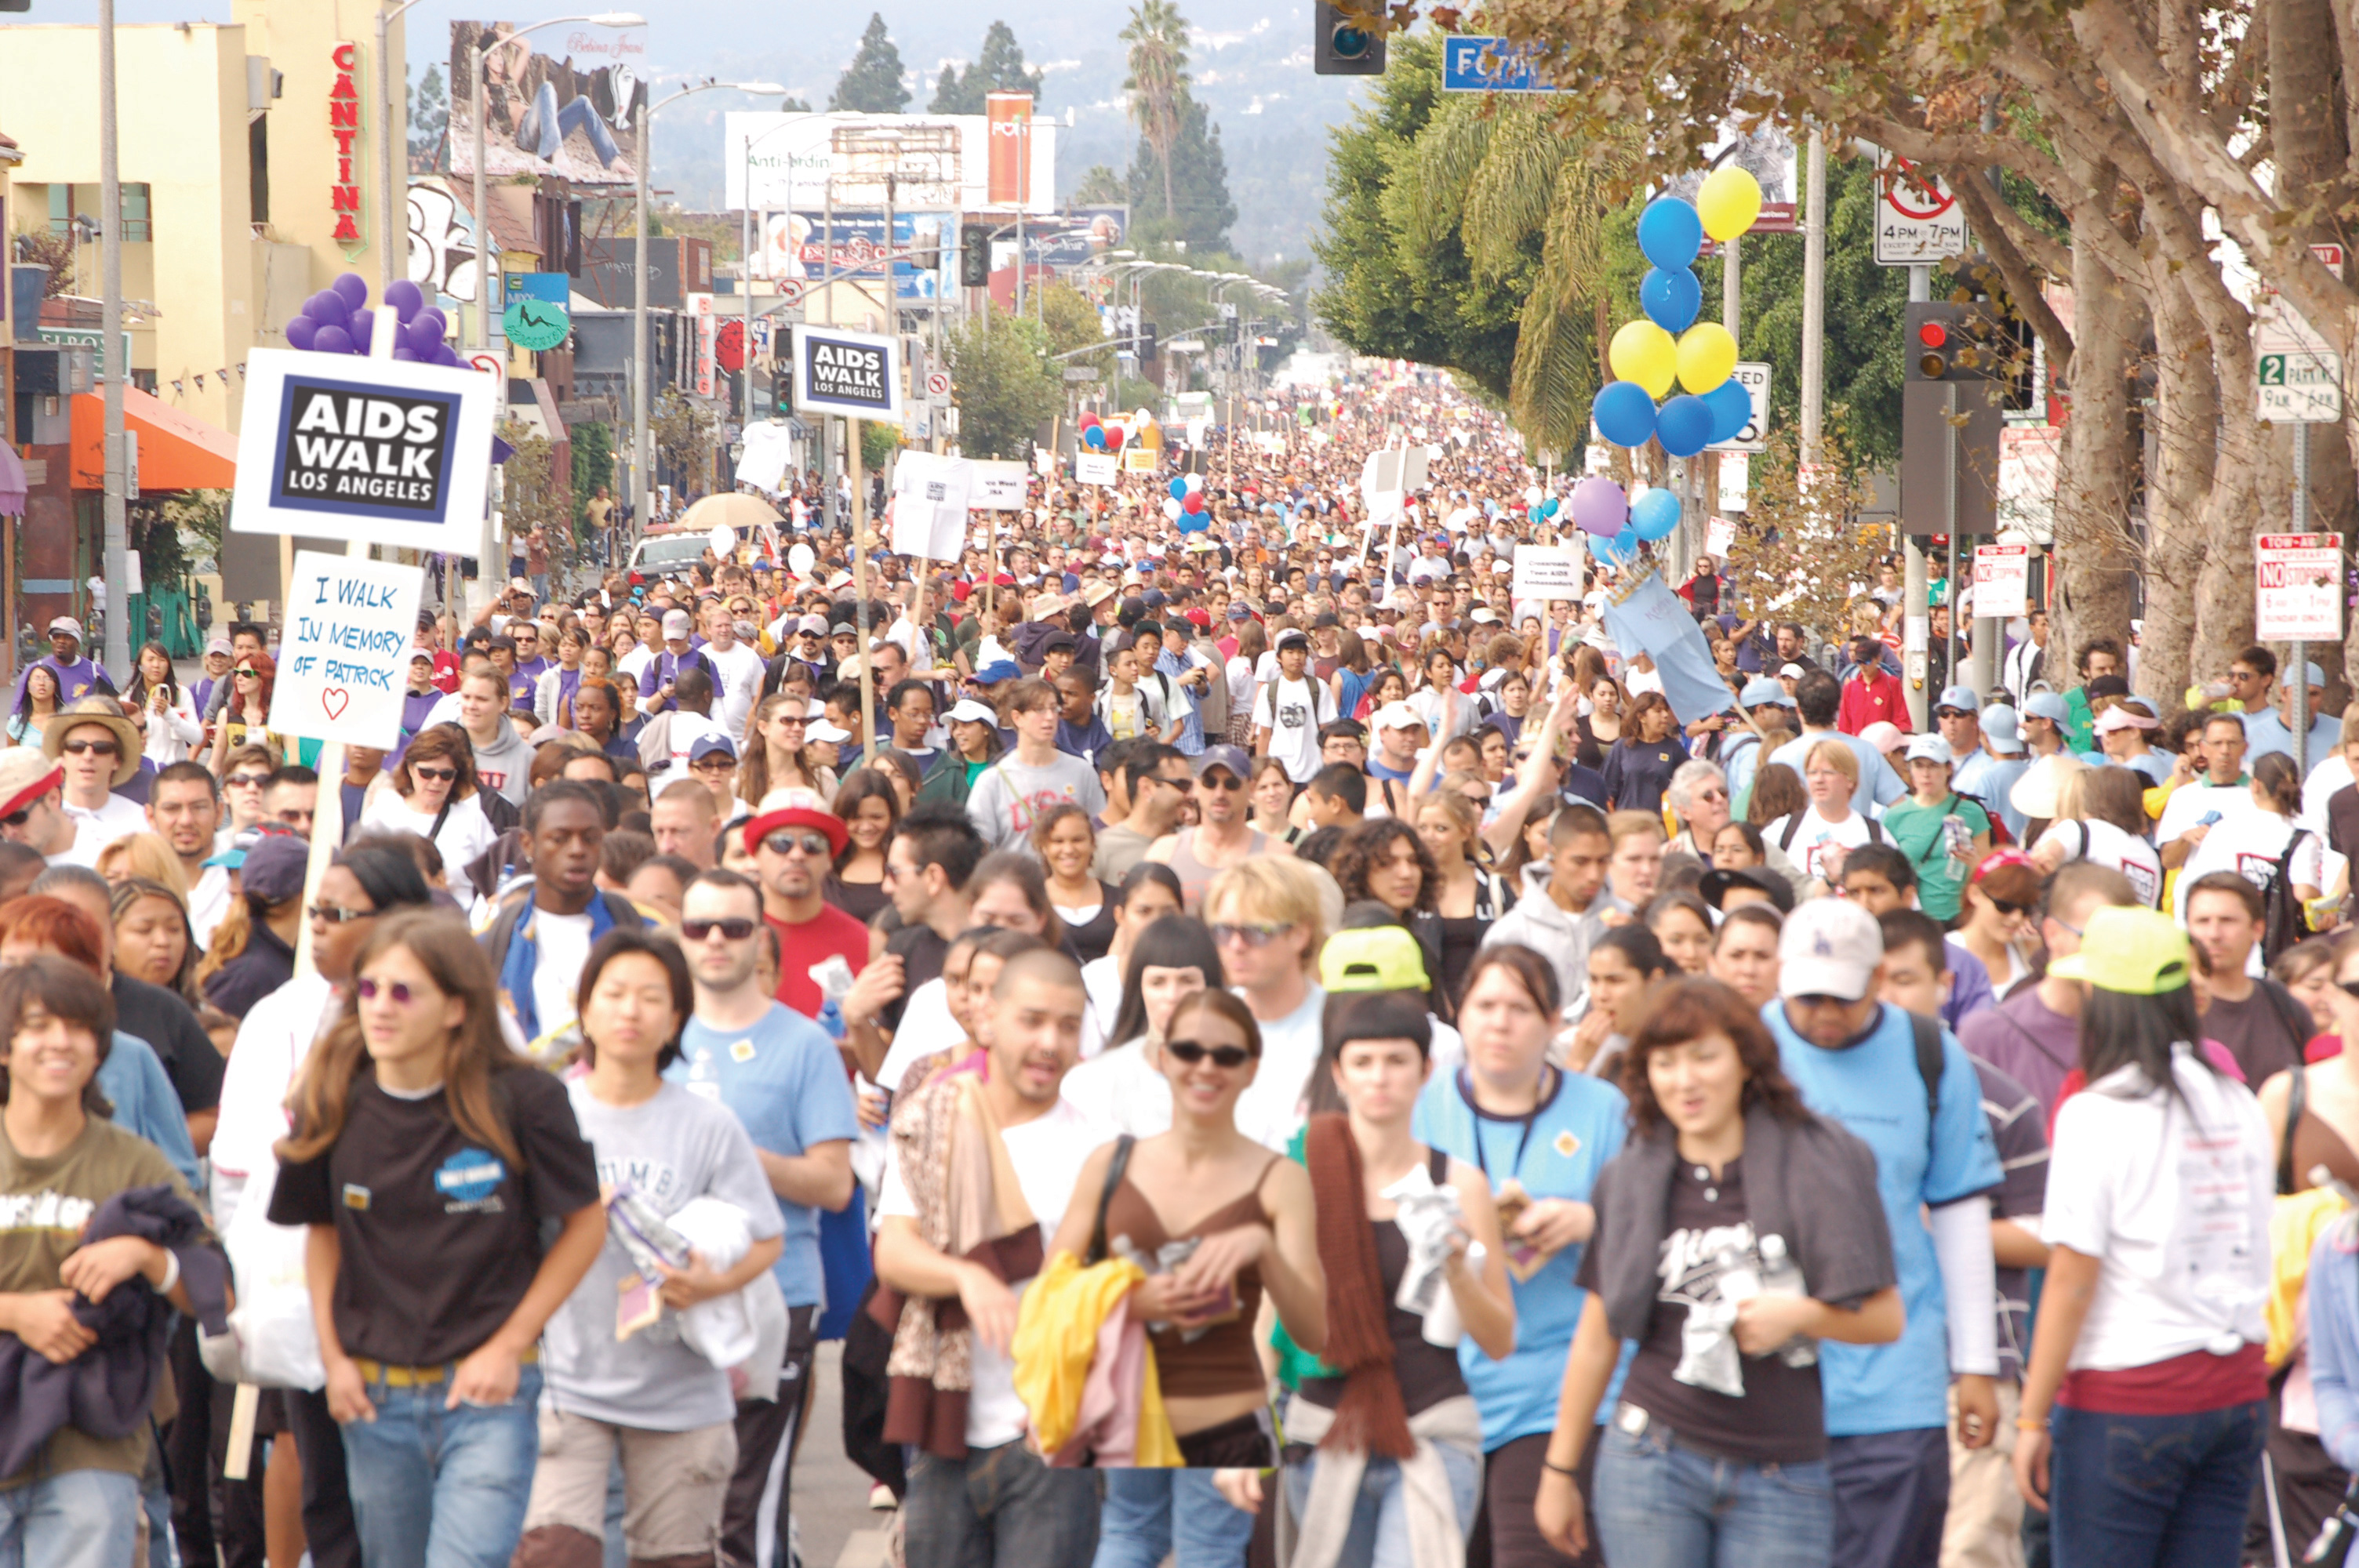 cantina-crowd(Adj)